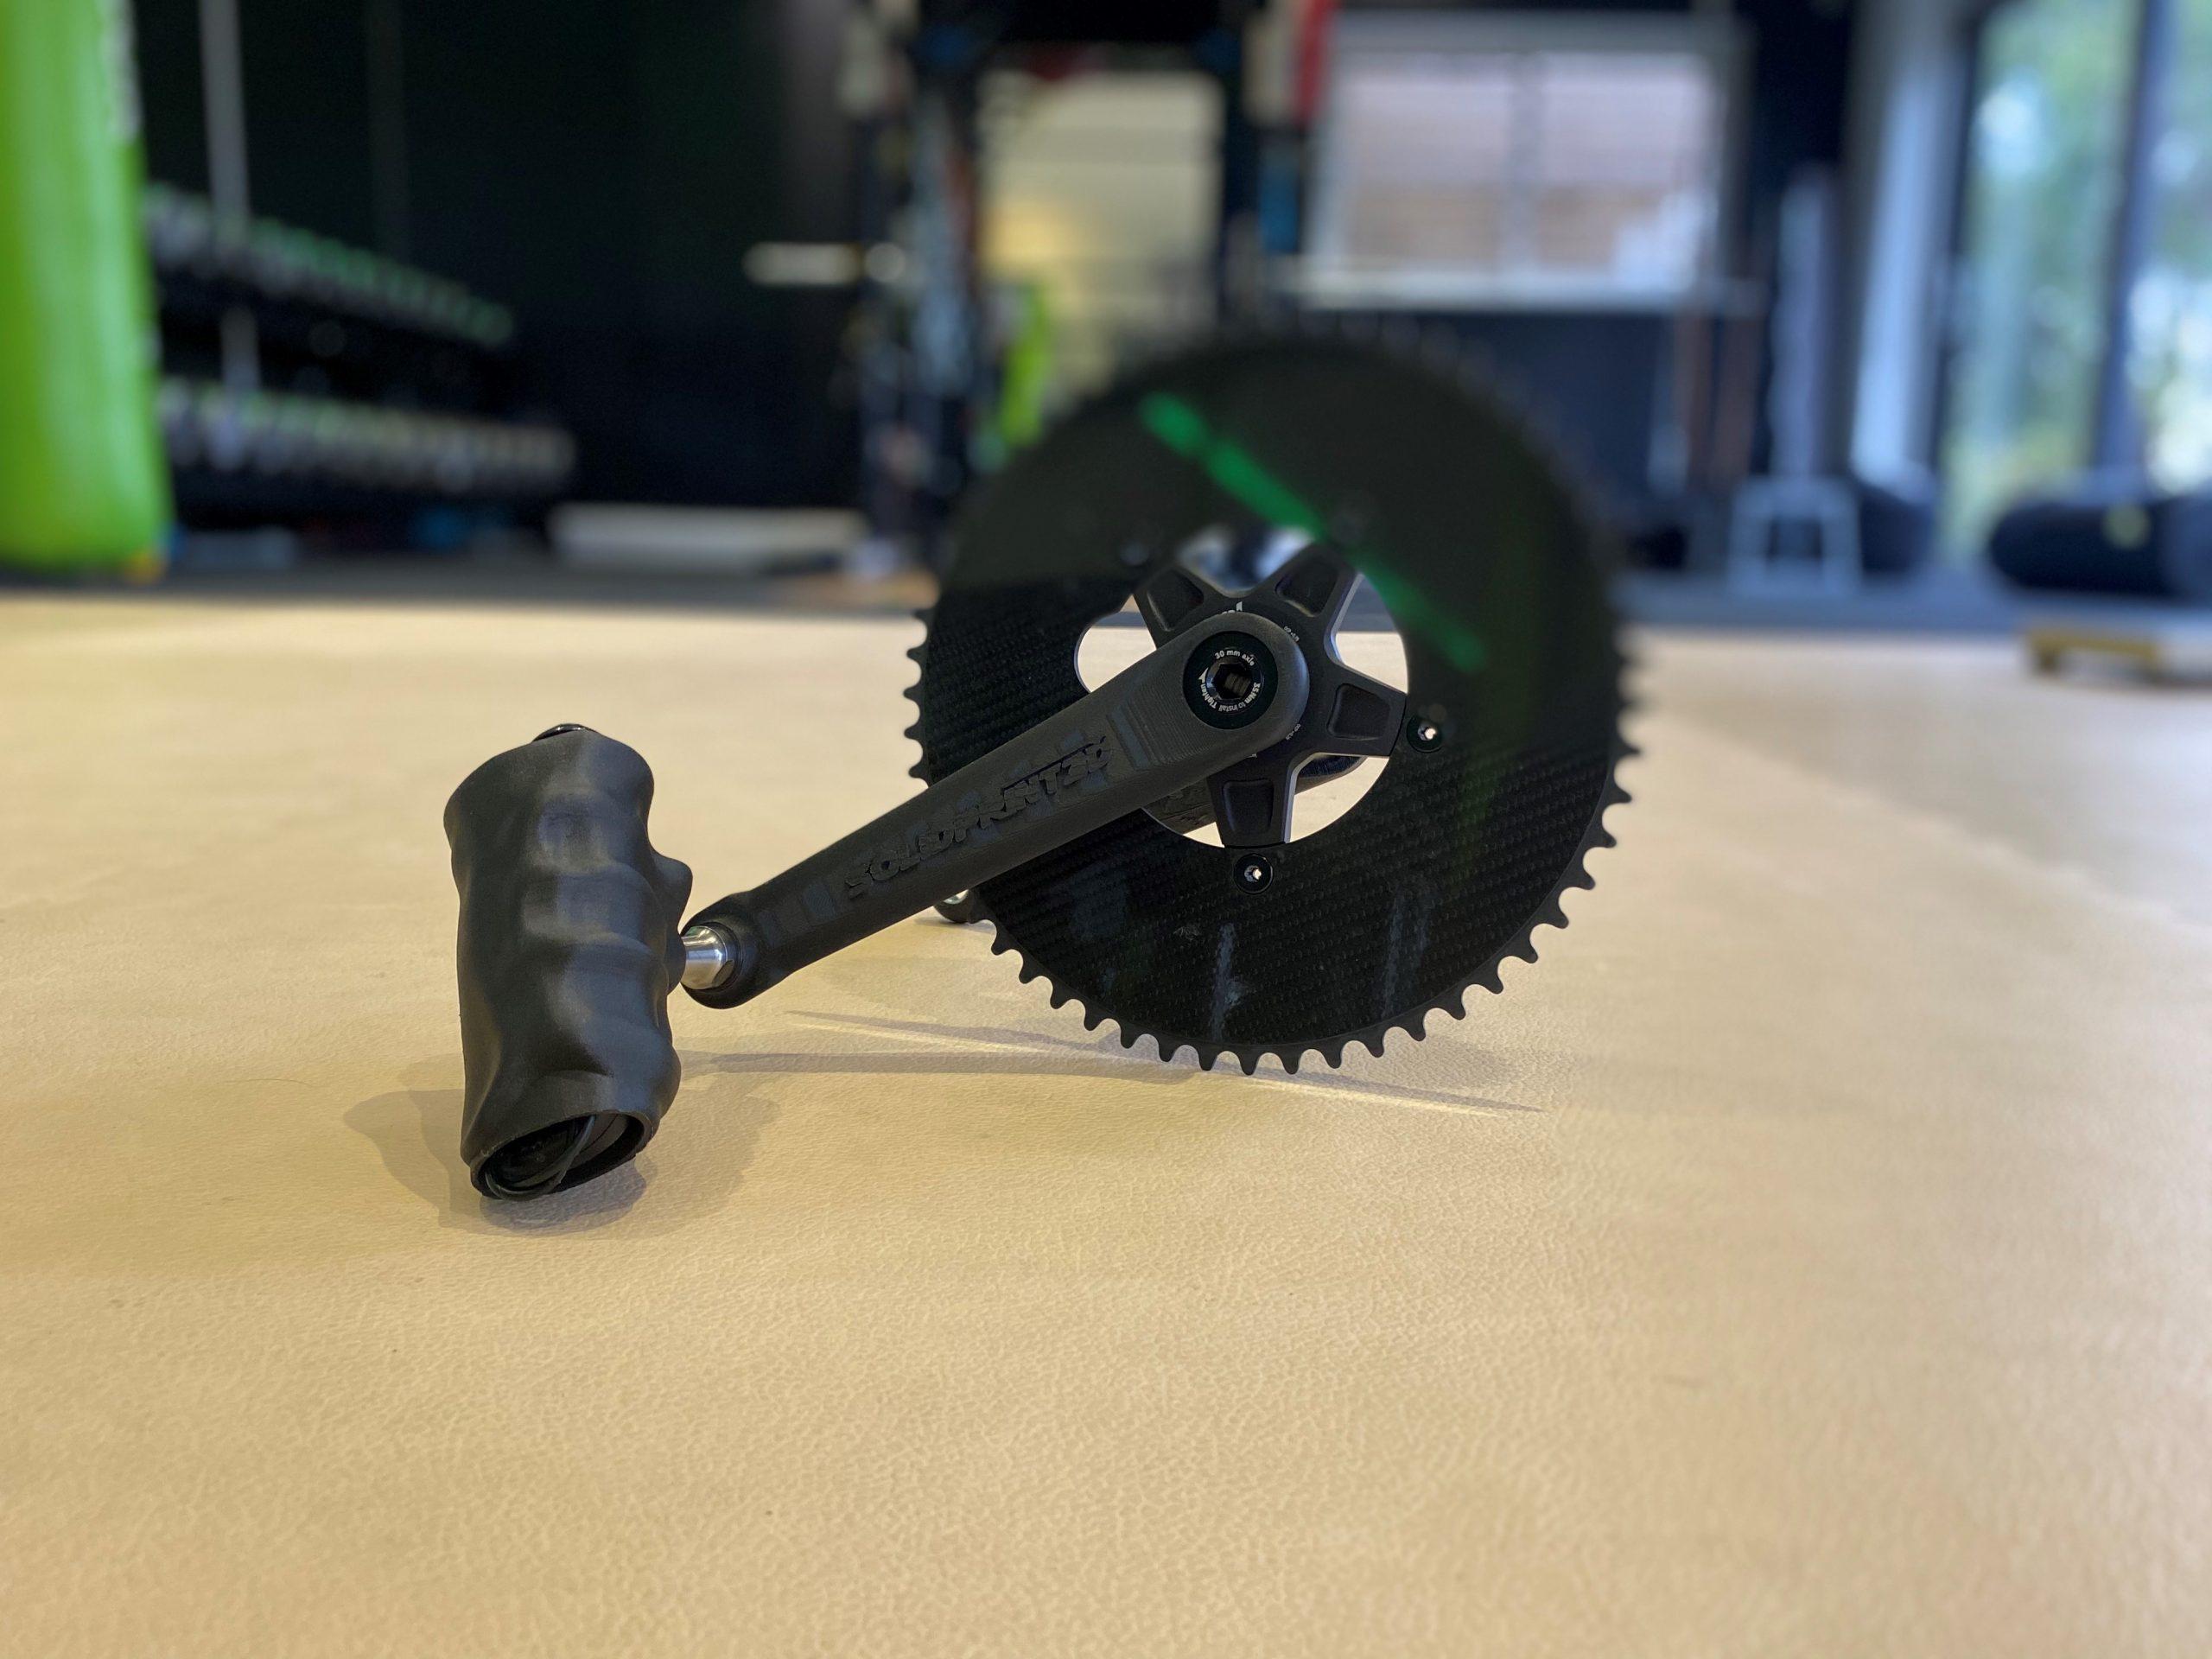 Townsend used a Markforged 3D printer to produce his custom handbike crank arm. Photo via Markforged.